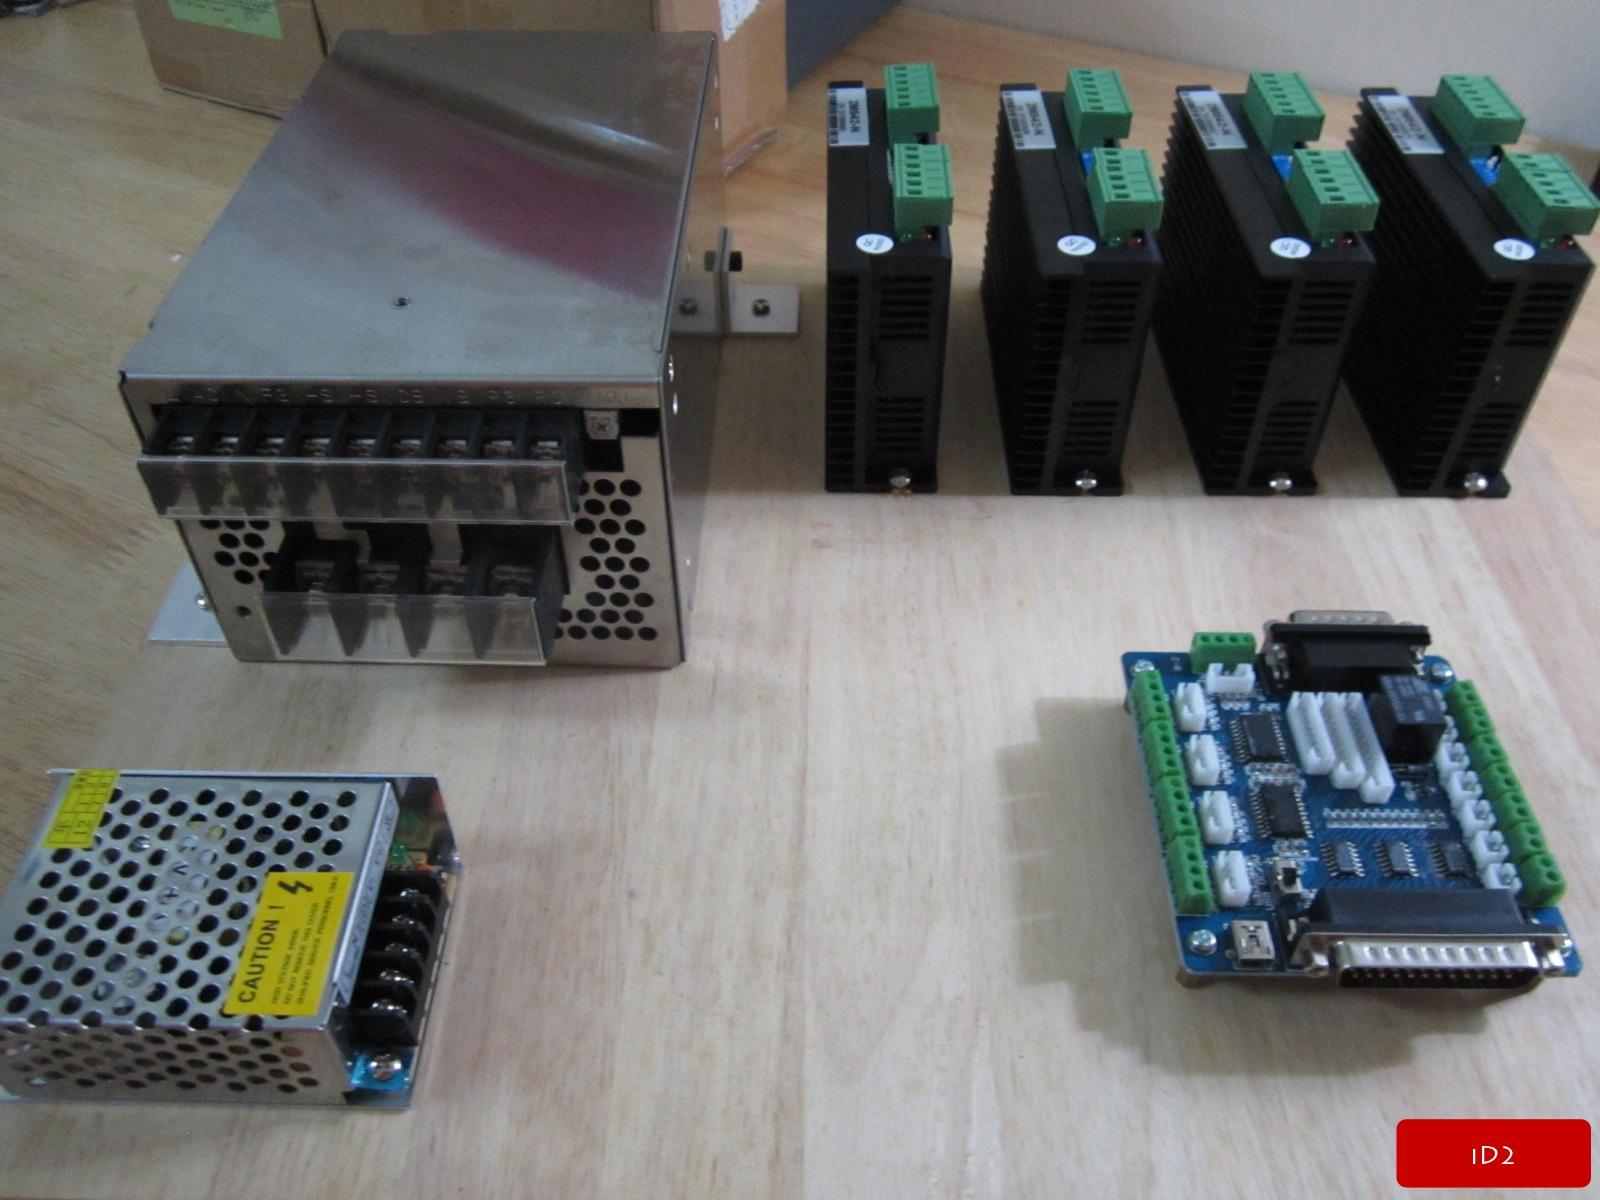 cnc electronics wiring \u2013 id2cnc Smart Home Wiring Diagram